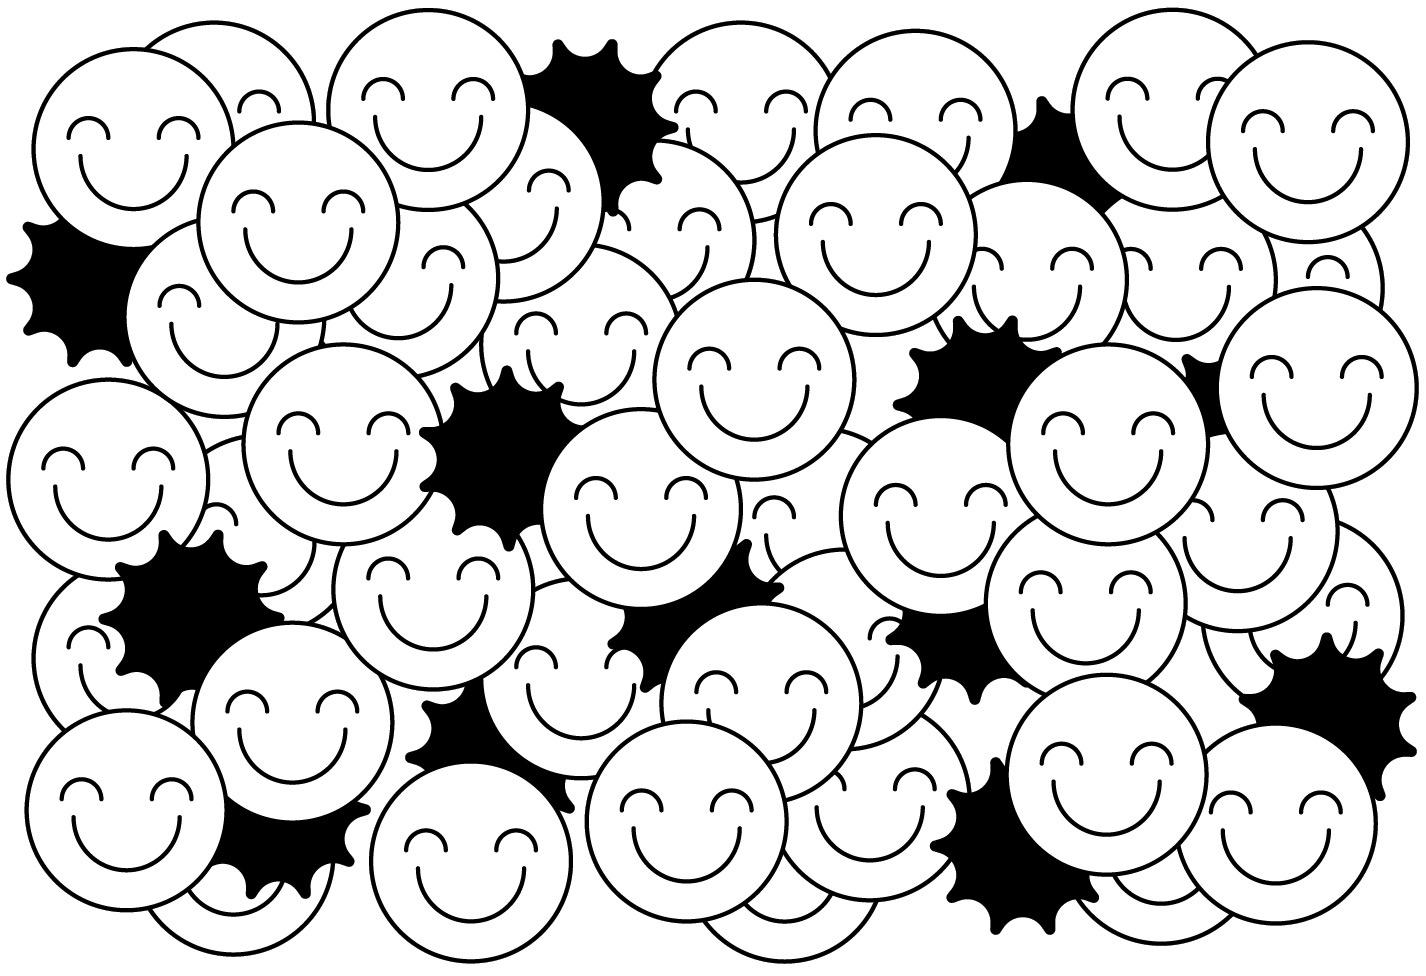 happiness illo